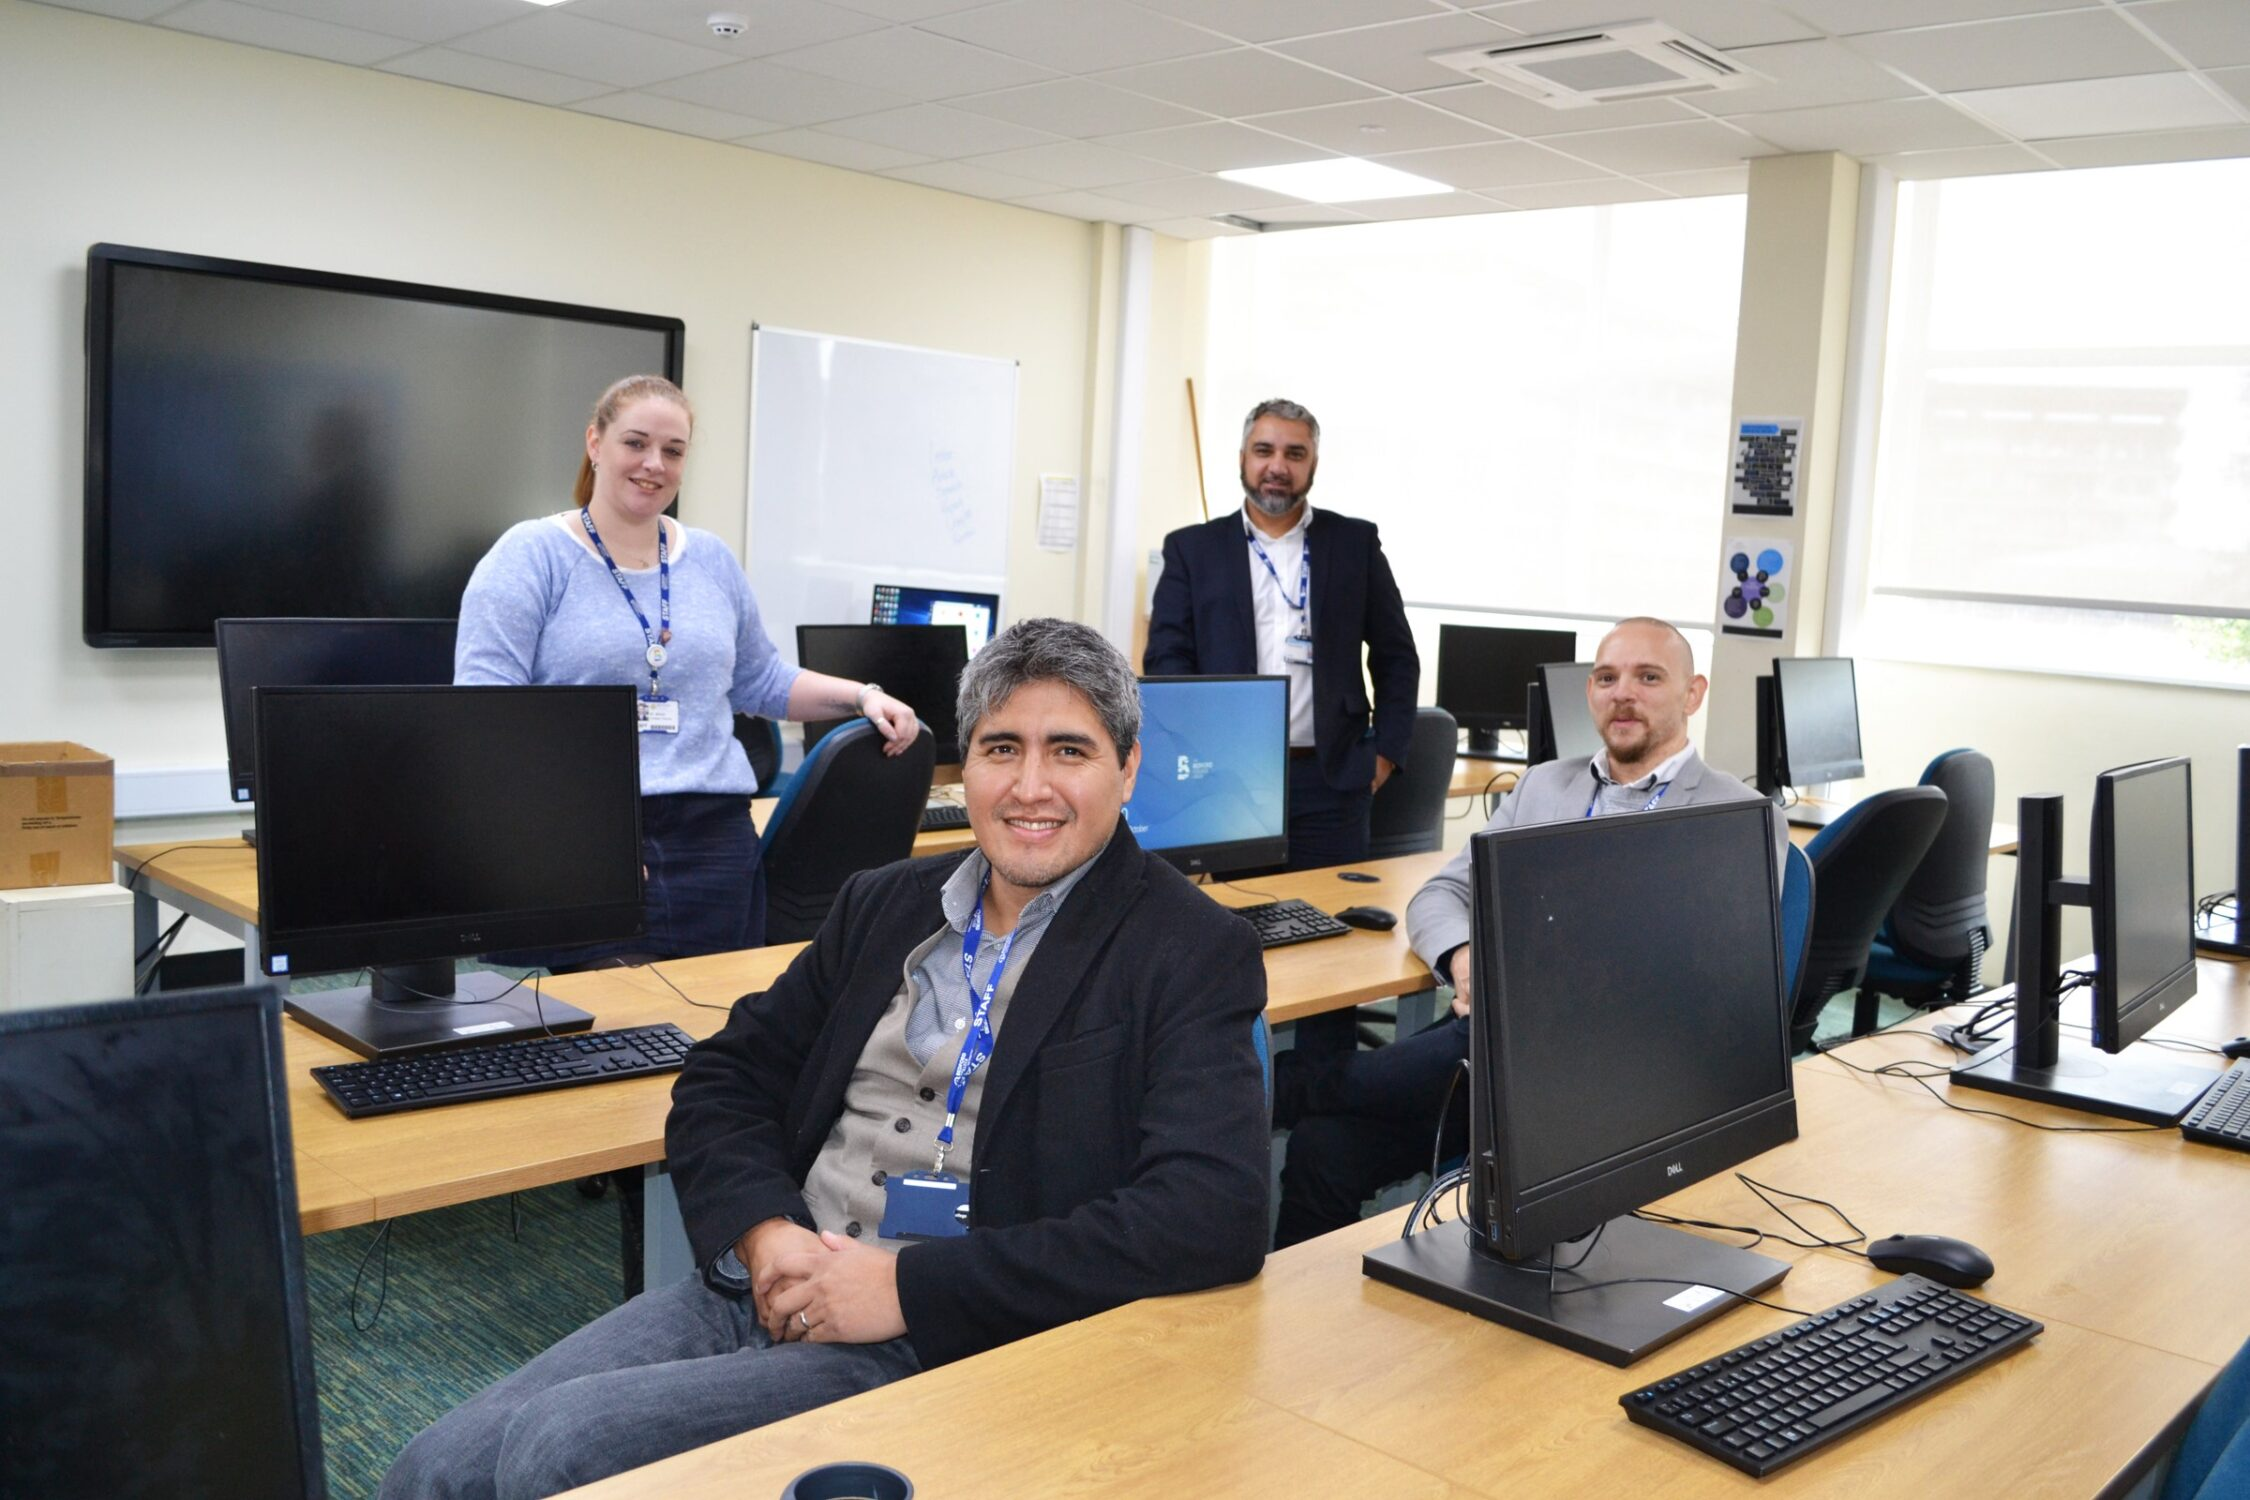 Computing tutors Bedford College degree learning